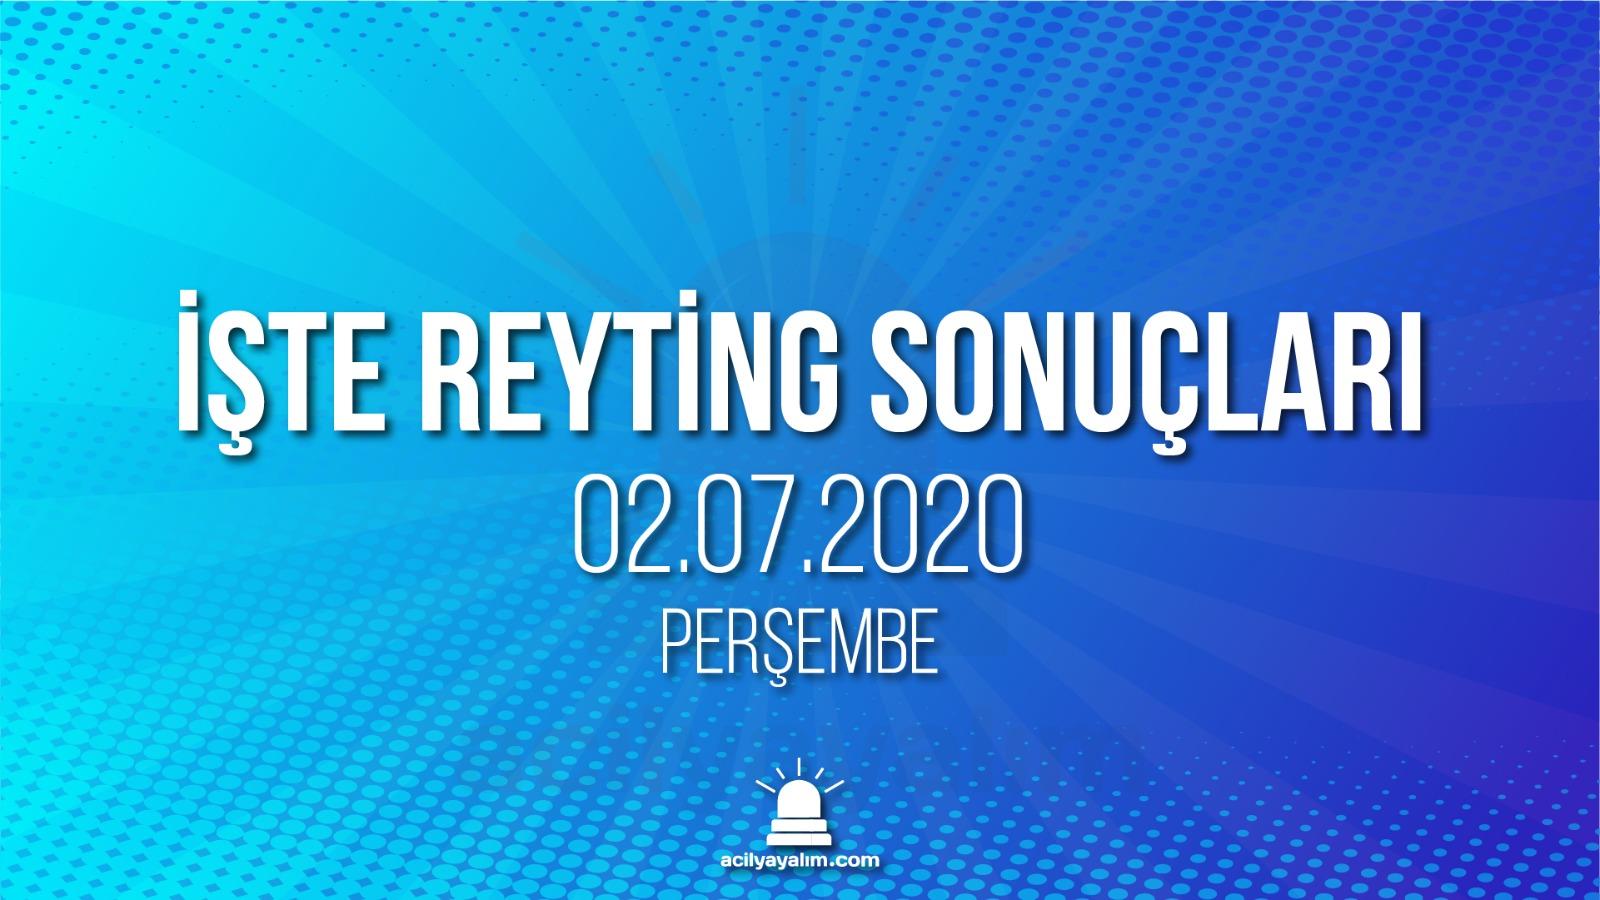 2 Temmuz 2020 Perşembe reyting sonuçları